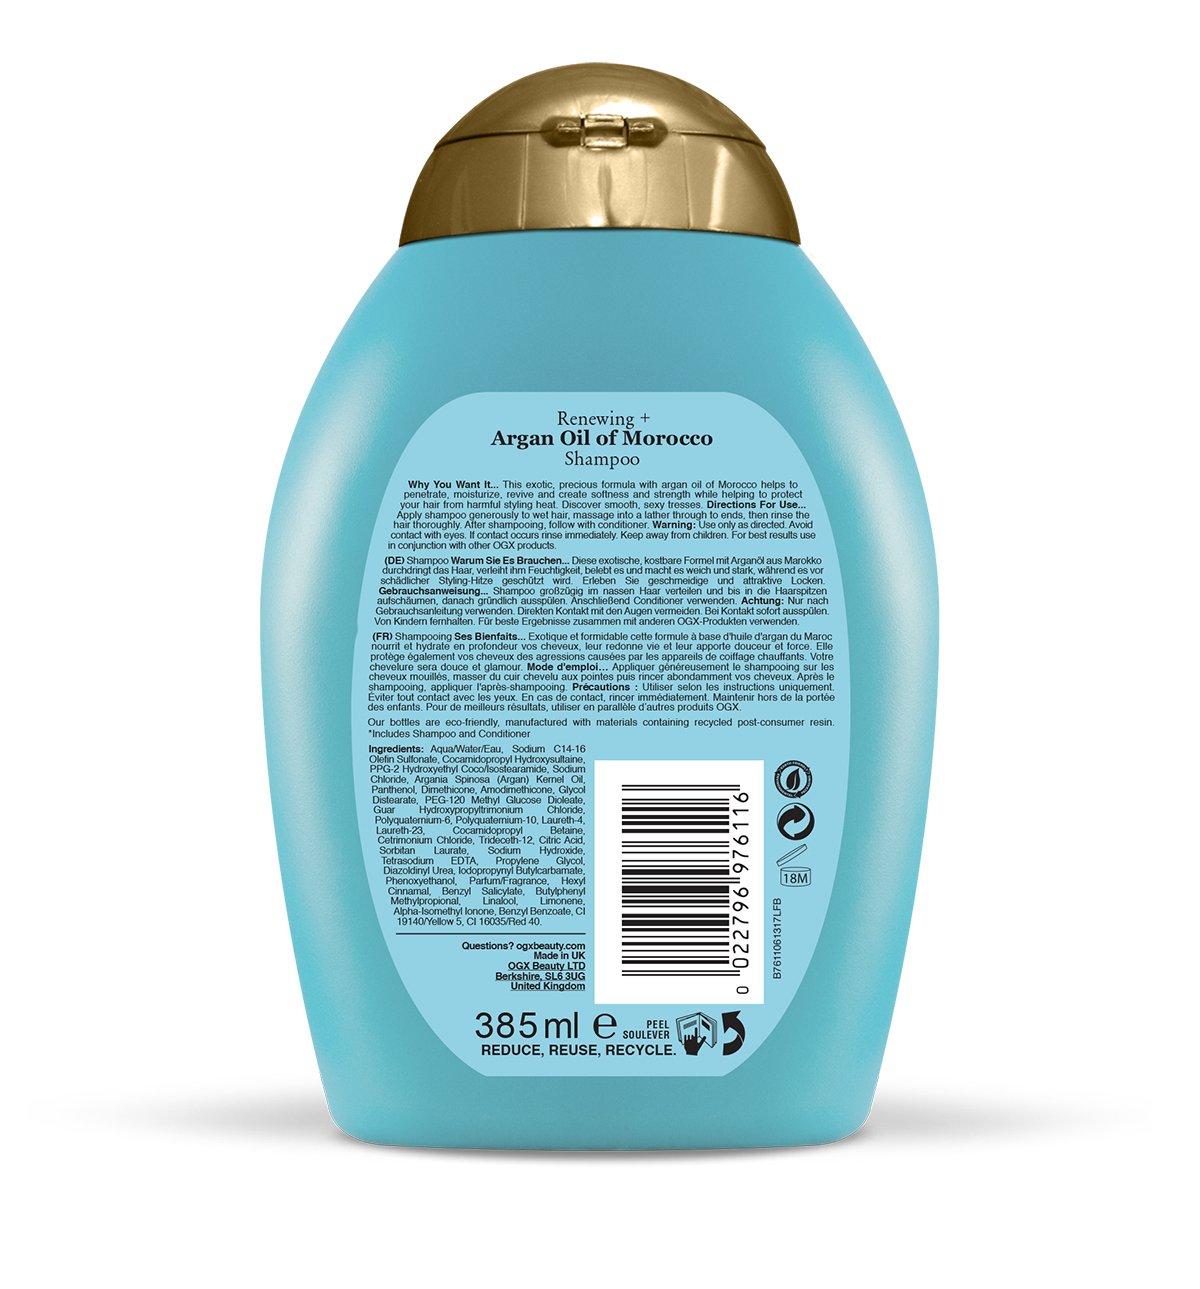 Ogx Renewing Argon Oil Of Morocco Shampoo 385ml Amazon Beauty